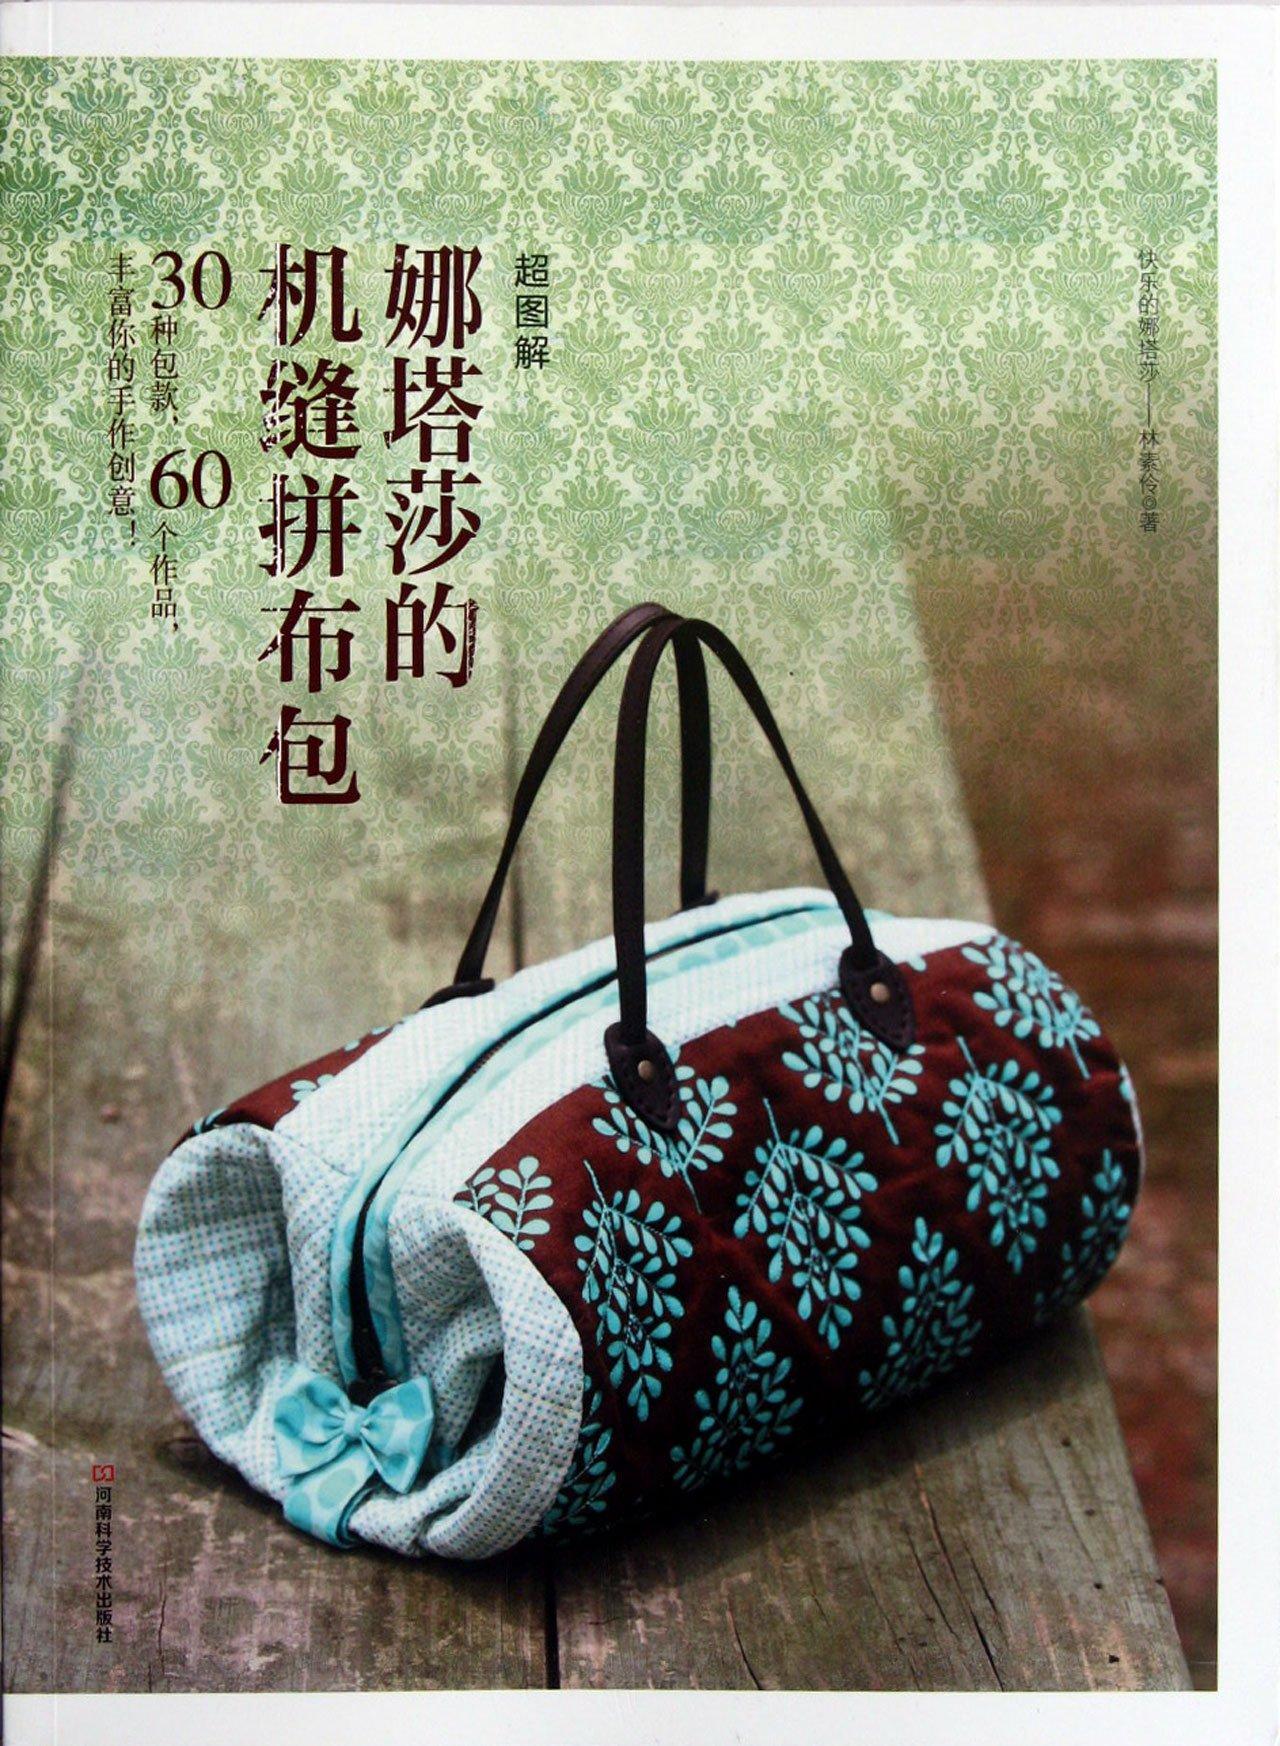 Patchwork Bag of Natasha (Chinese Edition) PDF